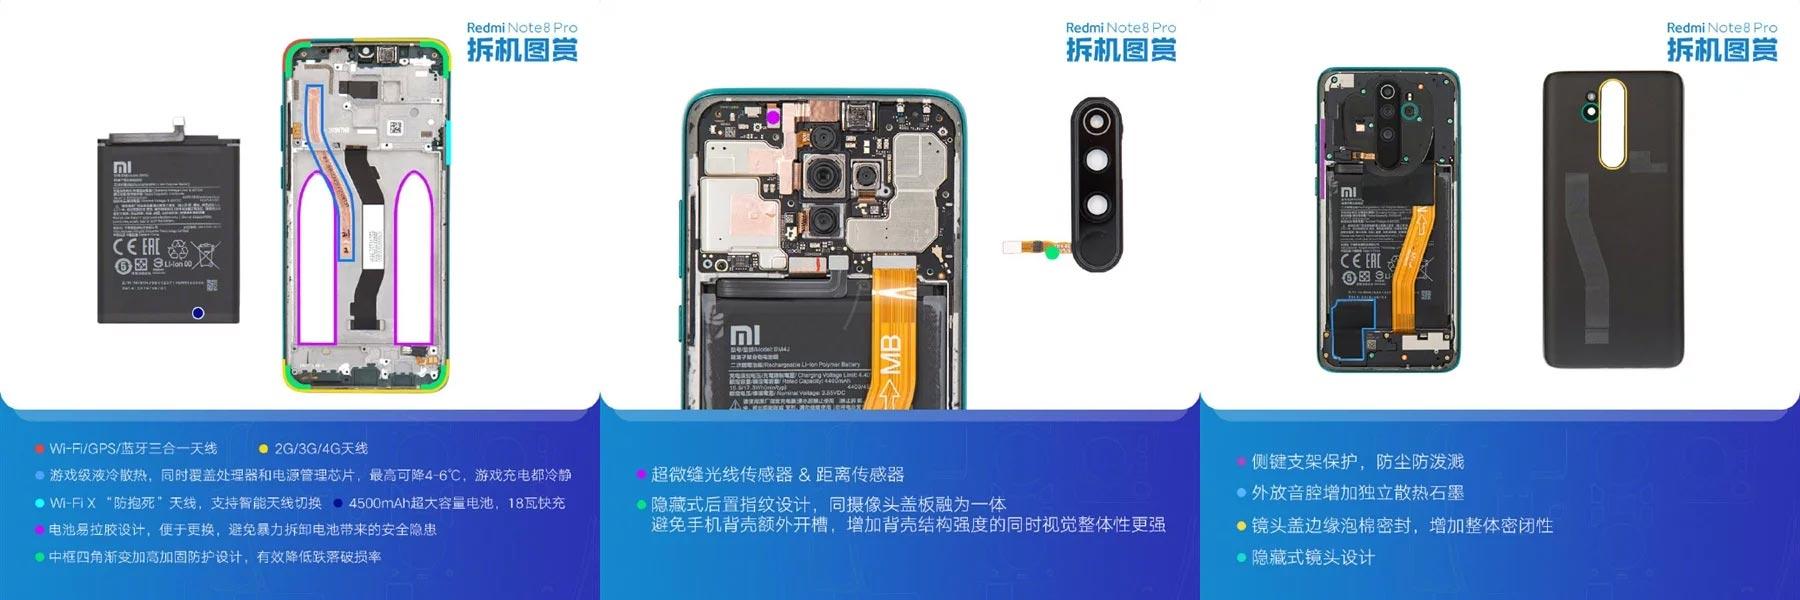 Redmi Note 8 Pro разборка